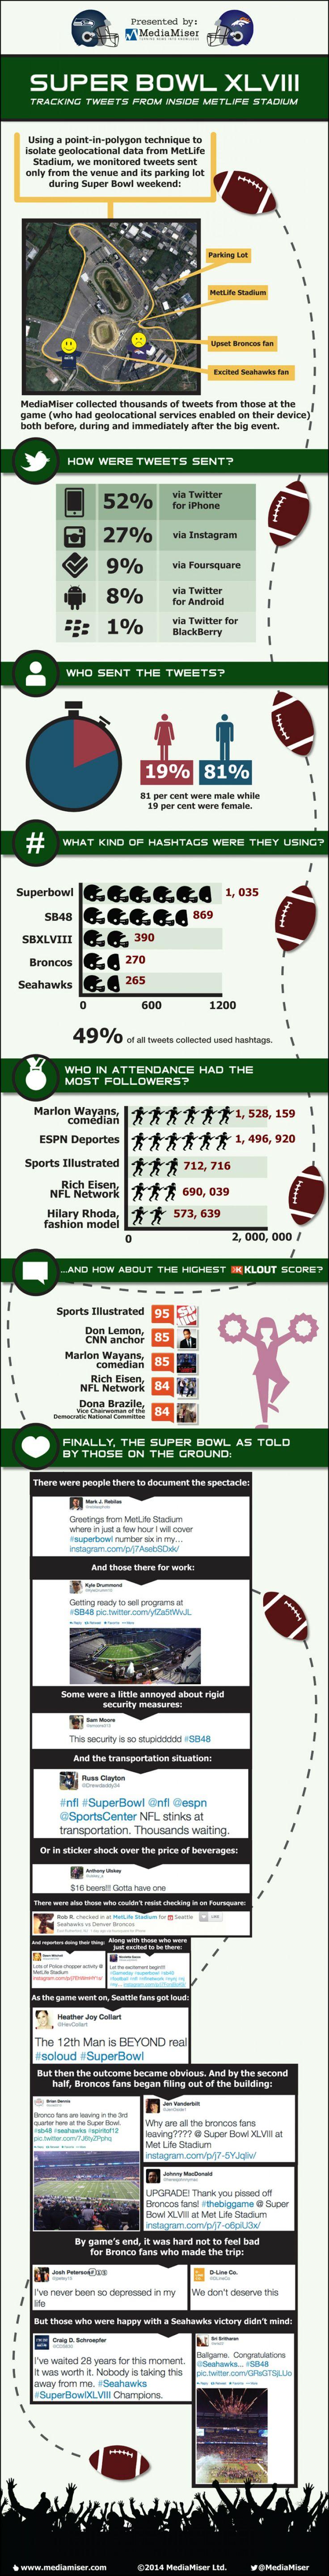 Super Bowl XLVIII: Tracking Tweets from Inside MetLife Stadium Infographic  @Heather Joy